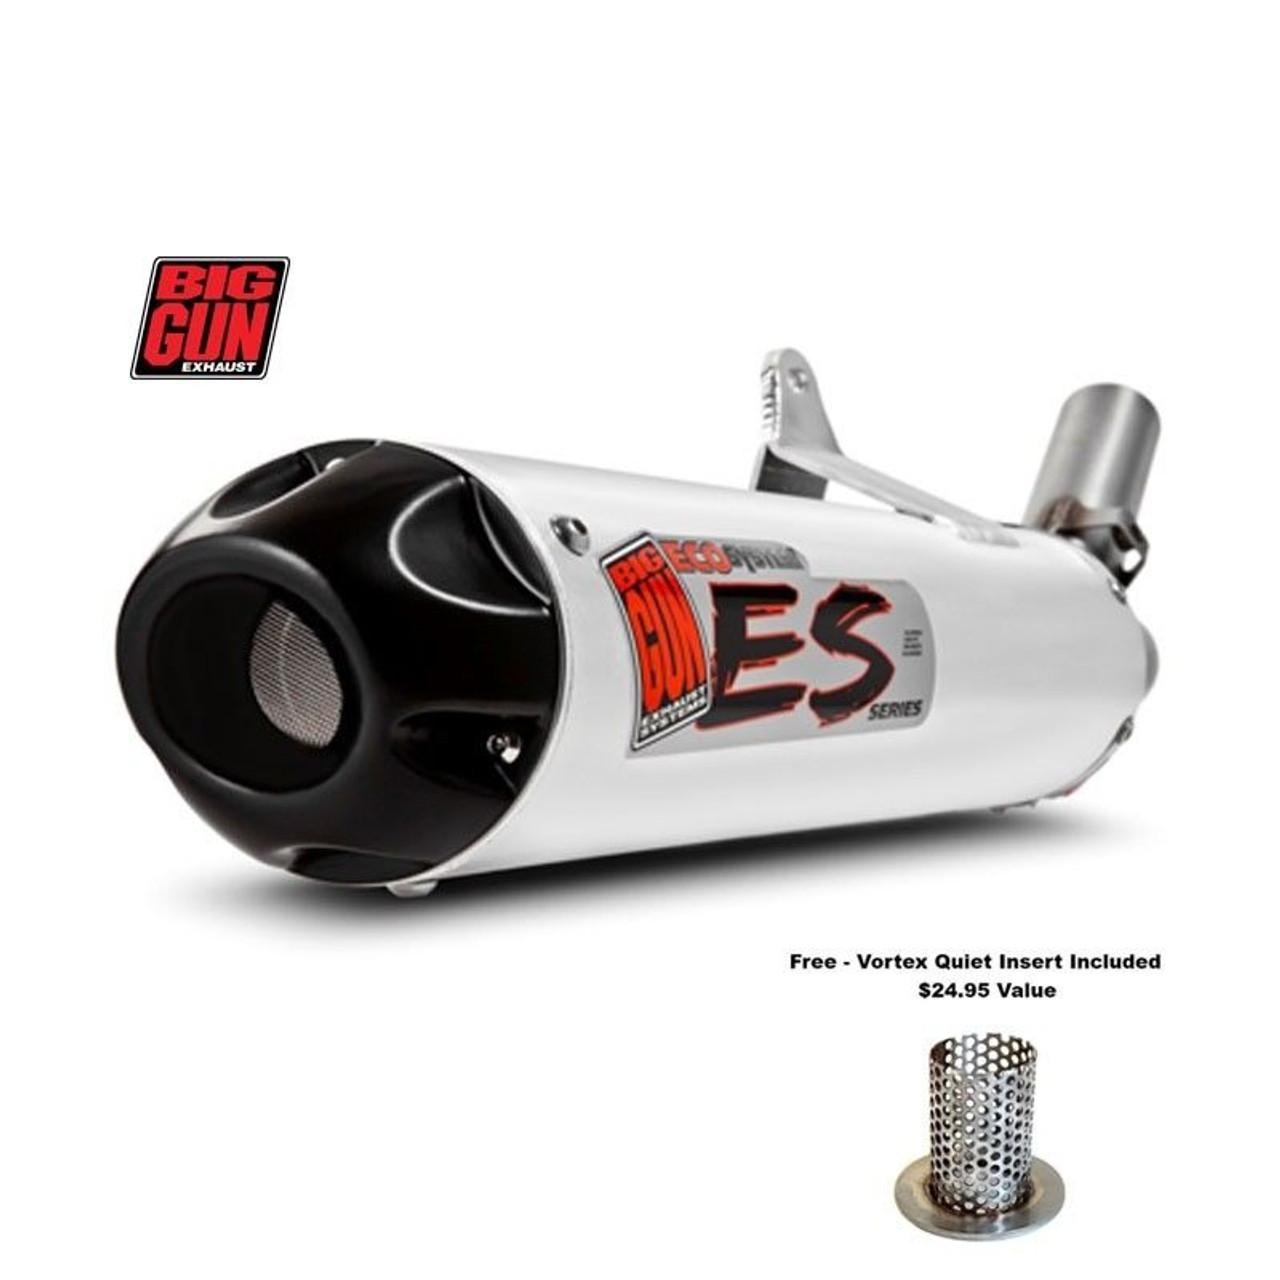 Big Gun Exhaust Power Box EFI TFI Fuel Controller Yamaha YFZ450R YFZ 450R 2015+